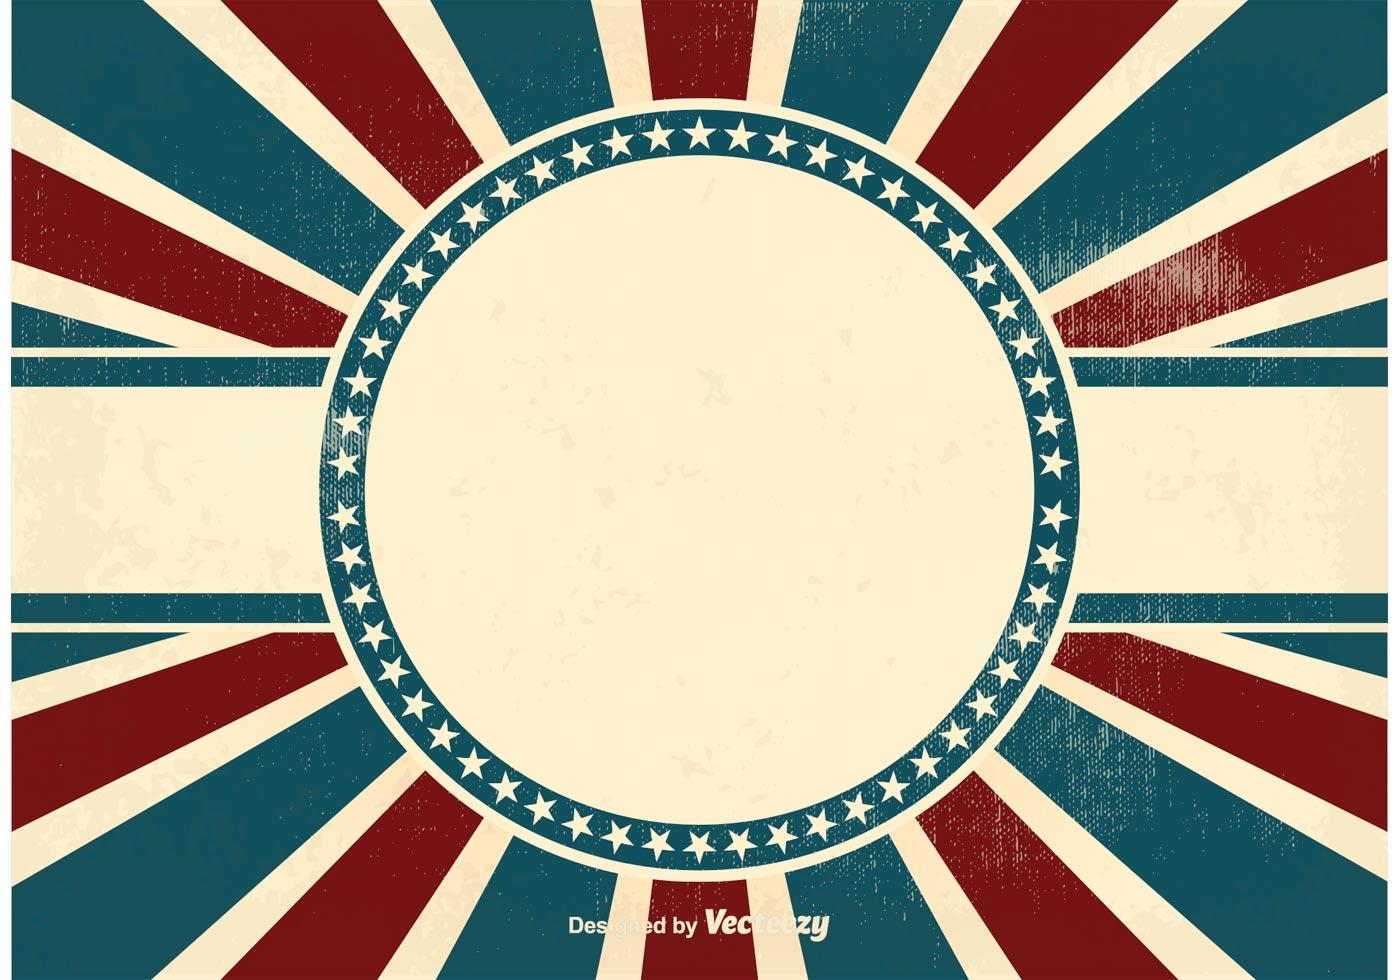 vintage patriotic background download free vector art stock